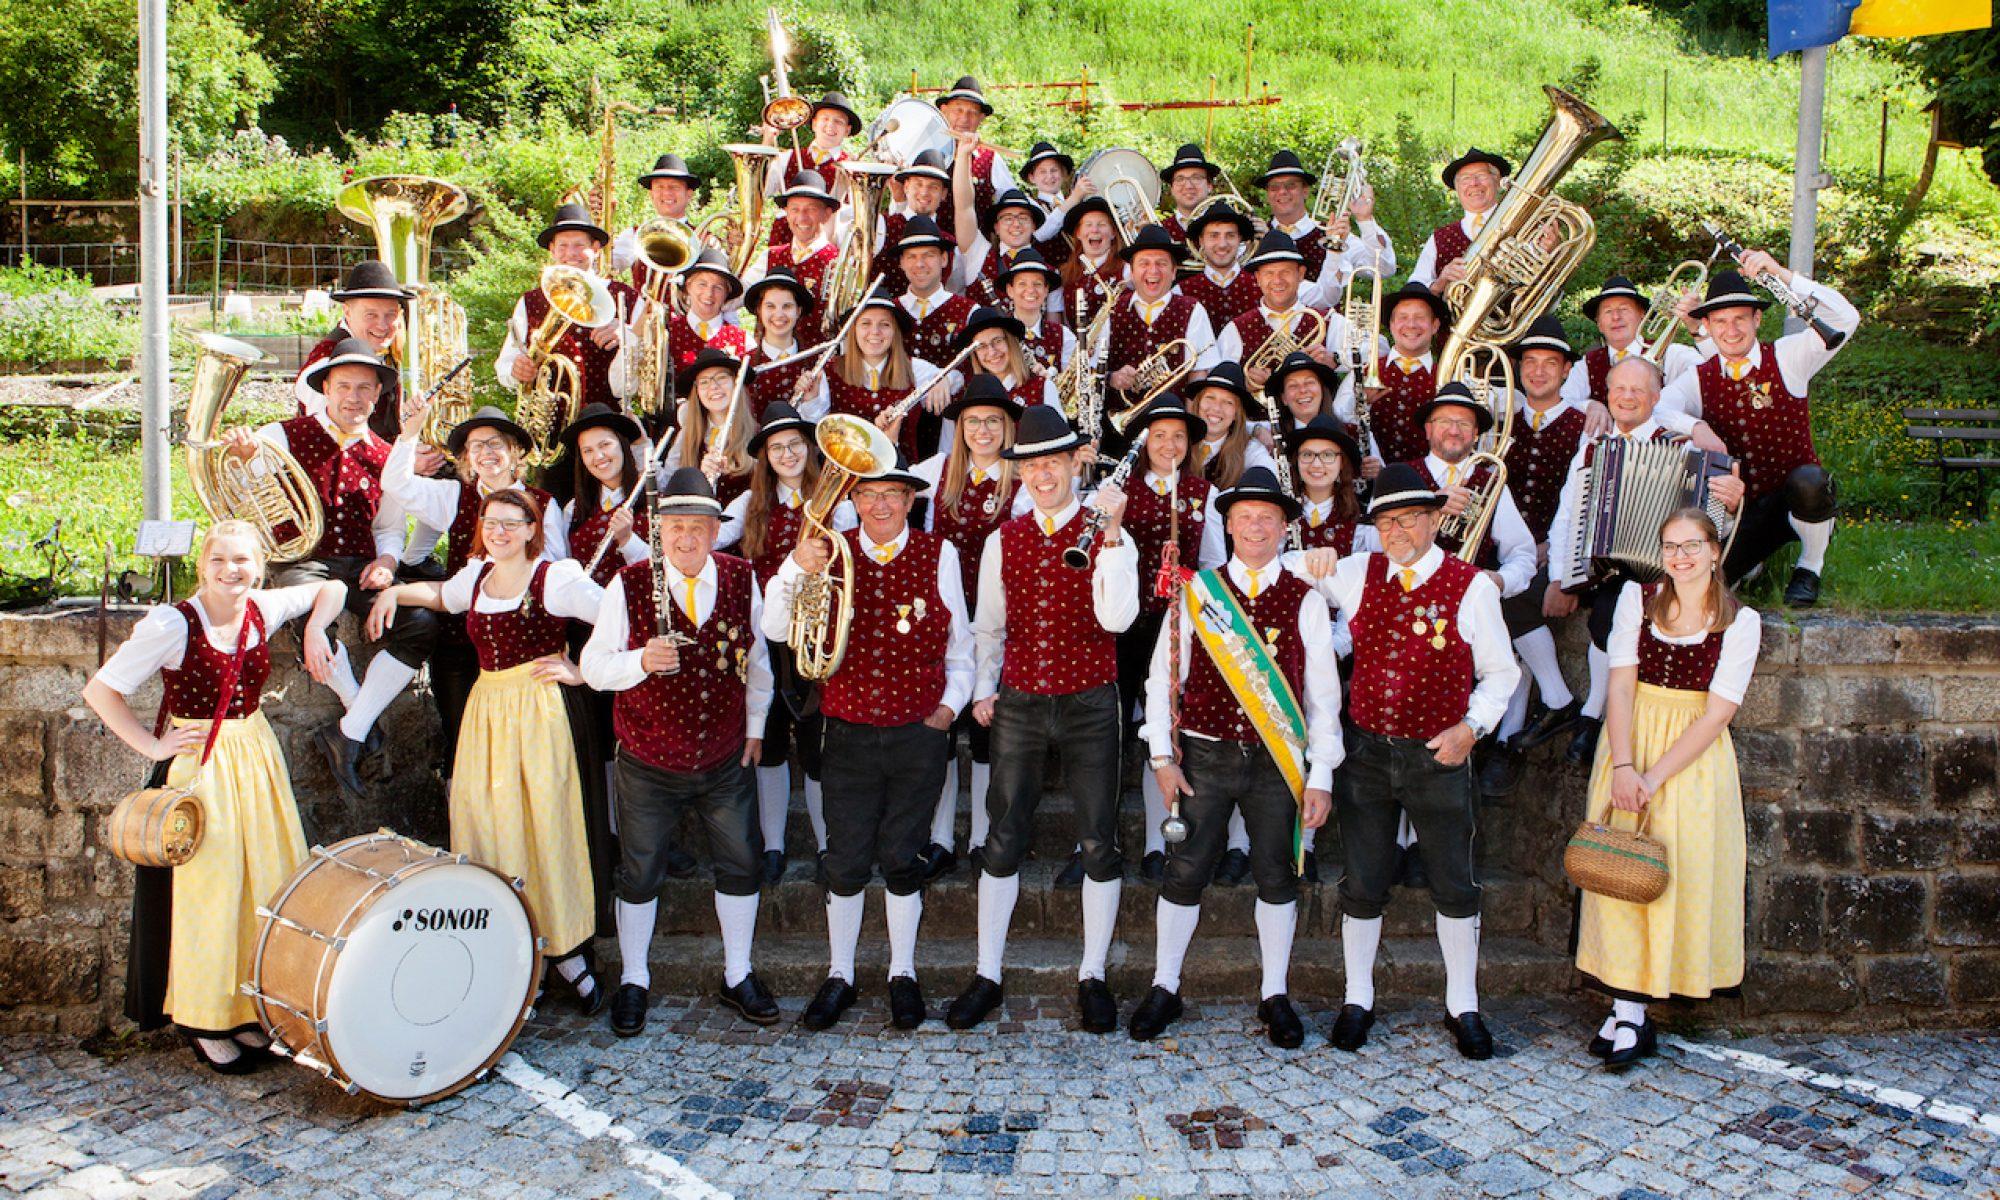 Musikverein d'Jeßnitztaler